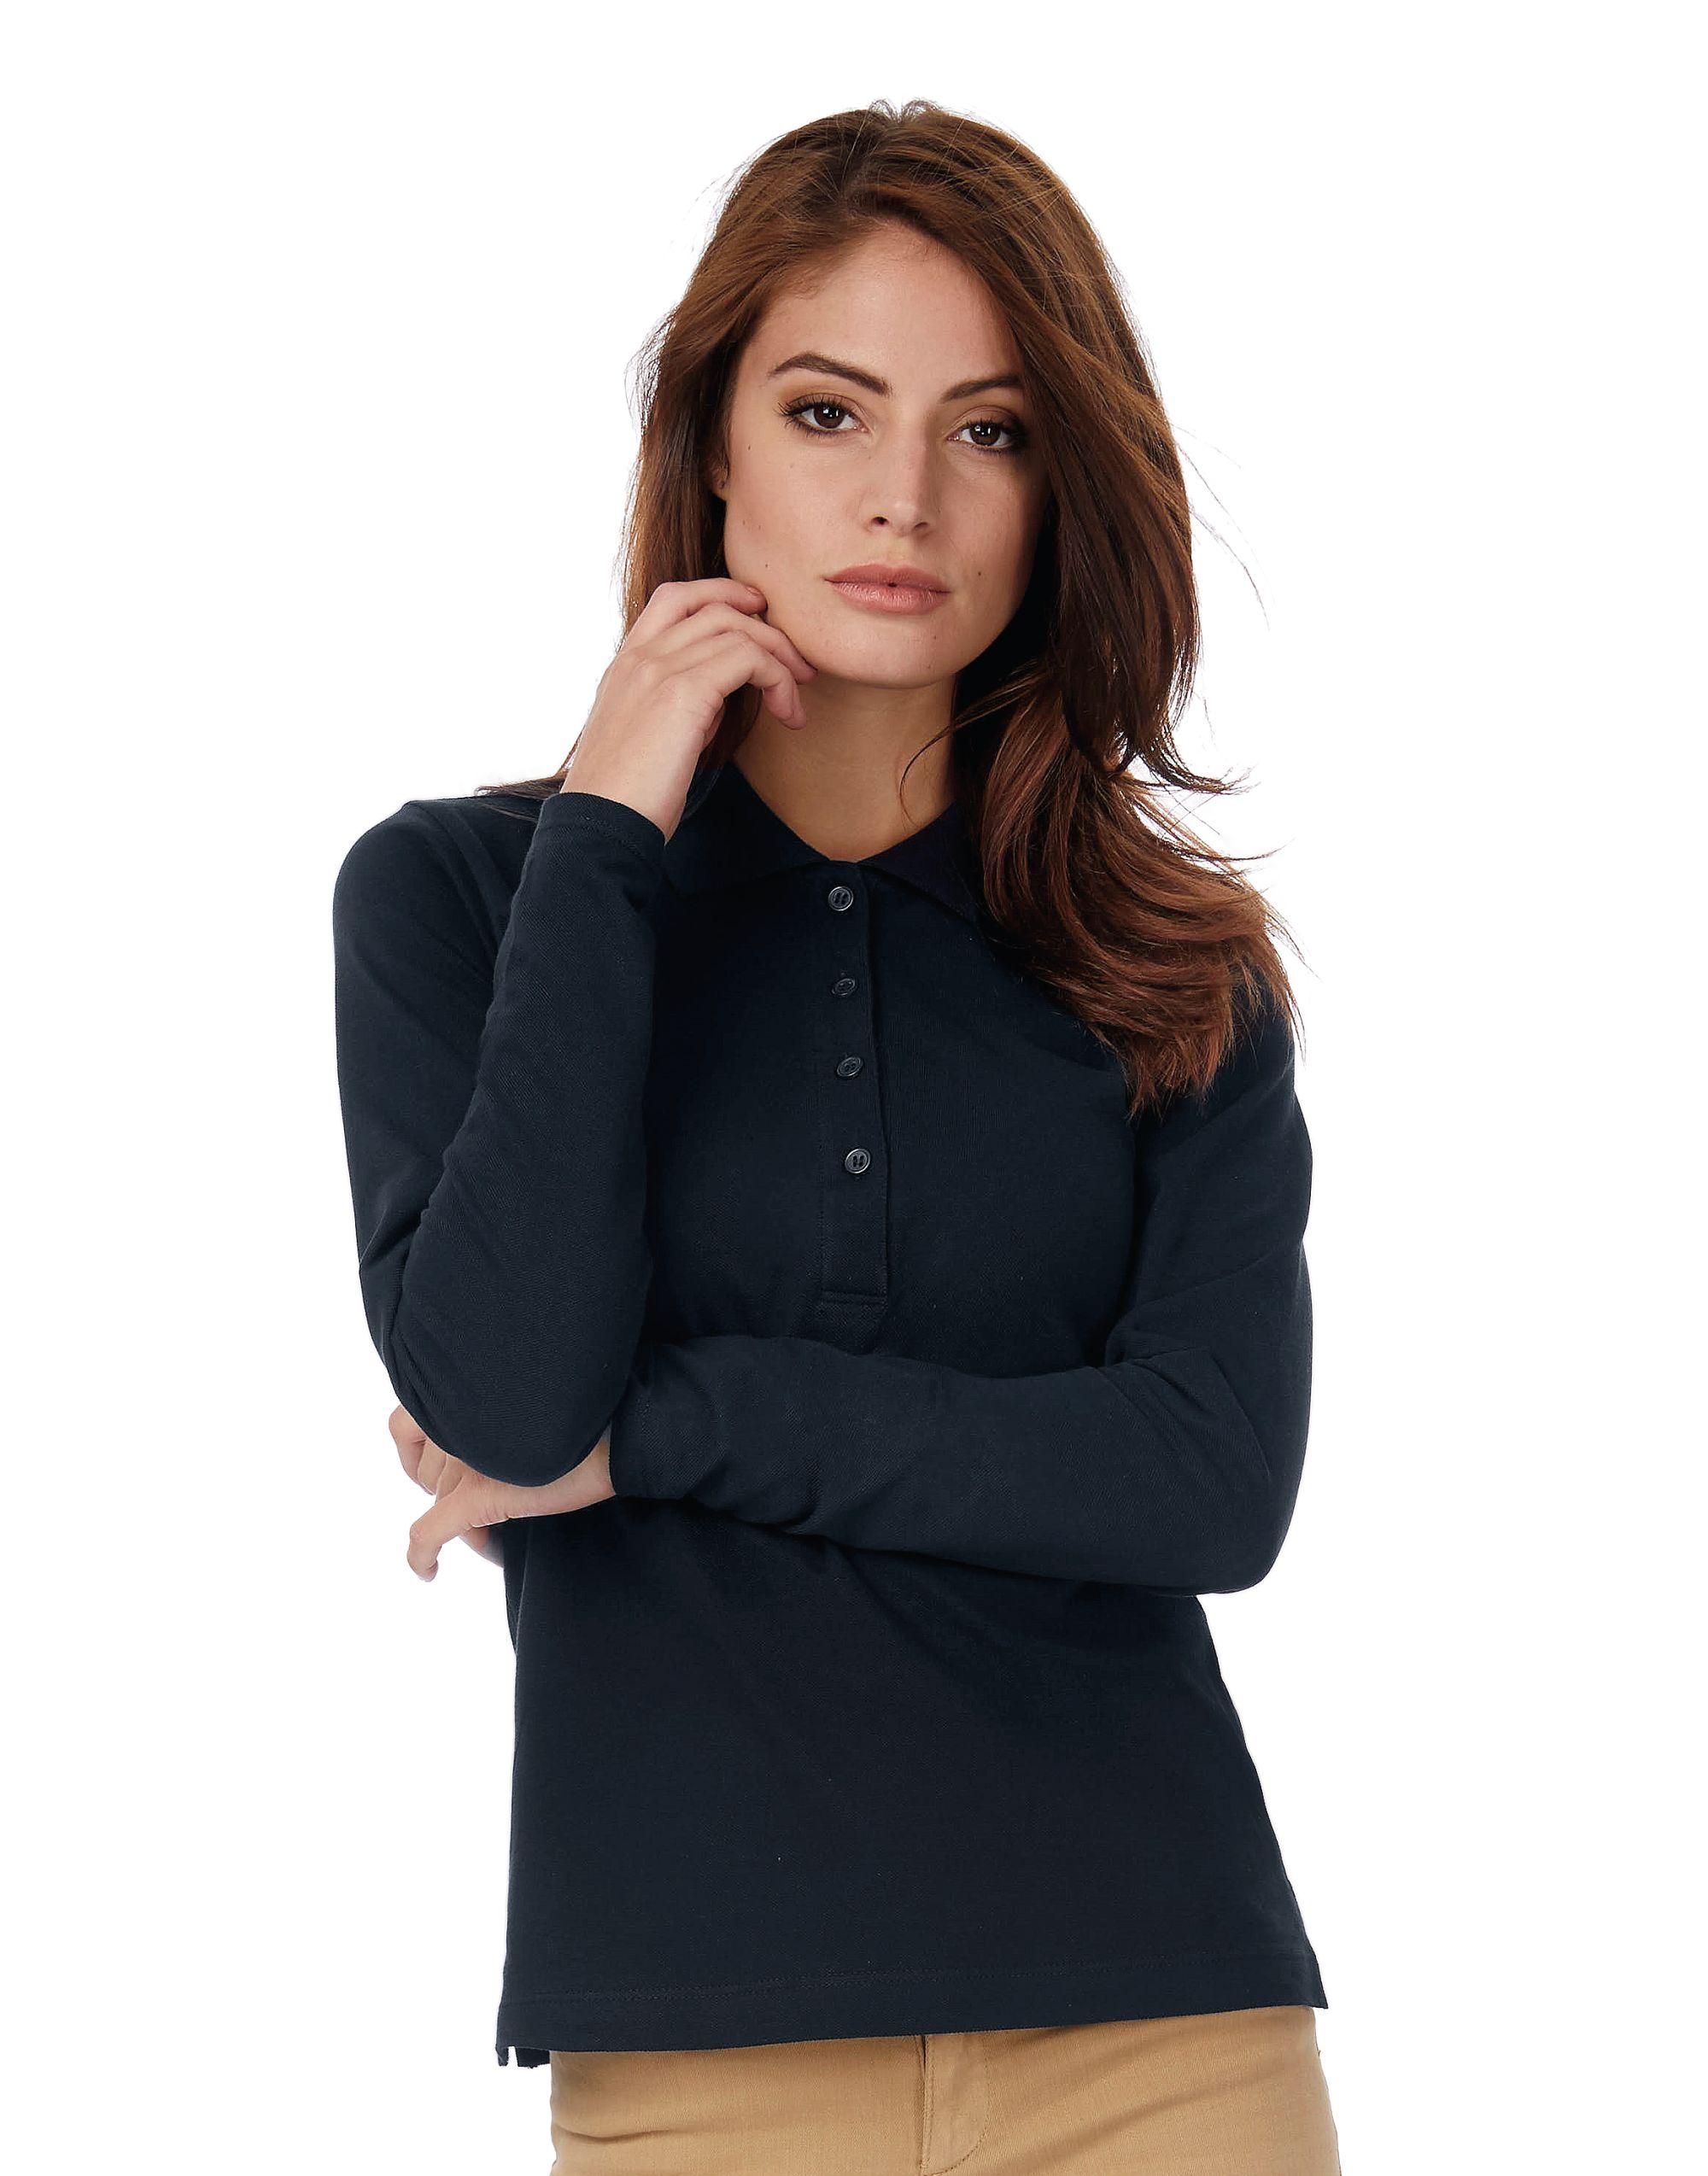 B&C Safran Pure Women's Long Sleeve Polo